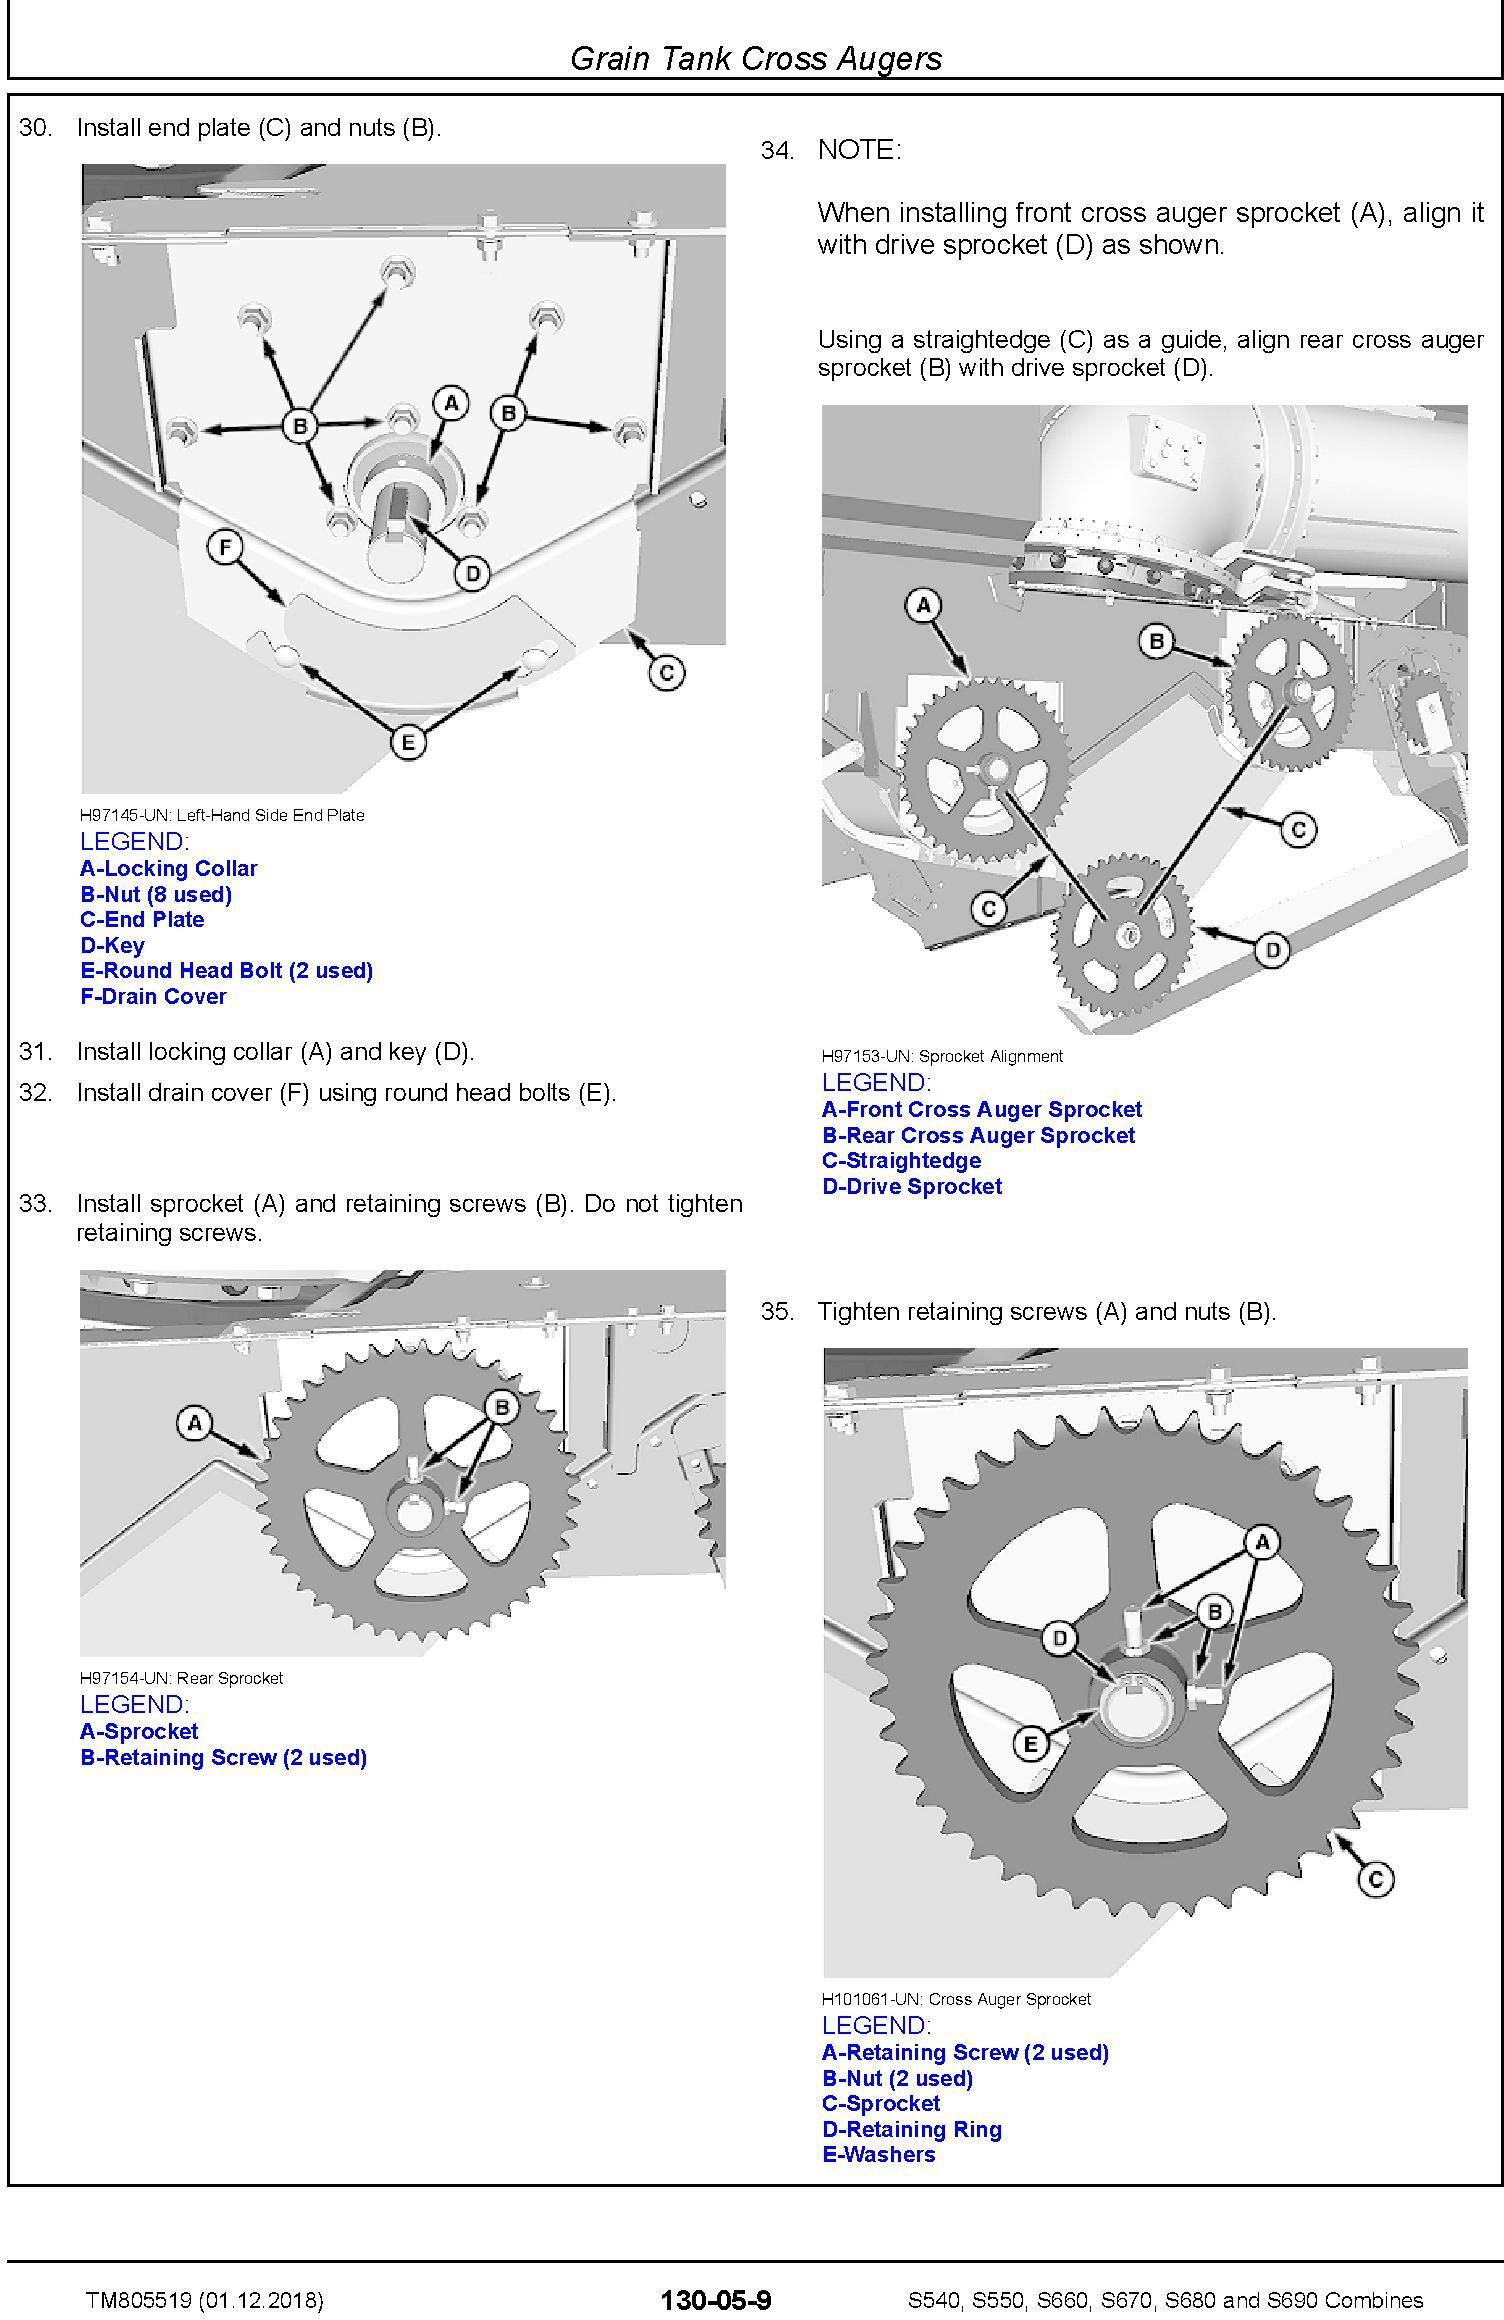 John Deere S540, S550, S660, S670, S680, S690 Combines (SN.120100-) Repair Technical Manual TM805519 - 1